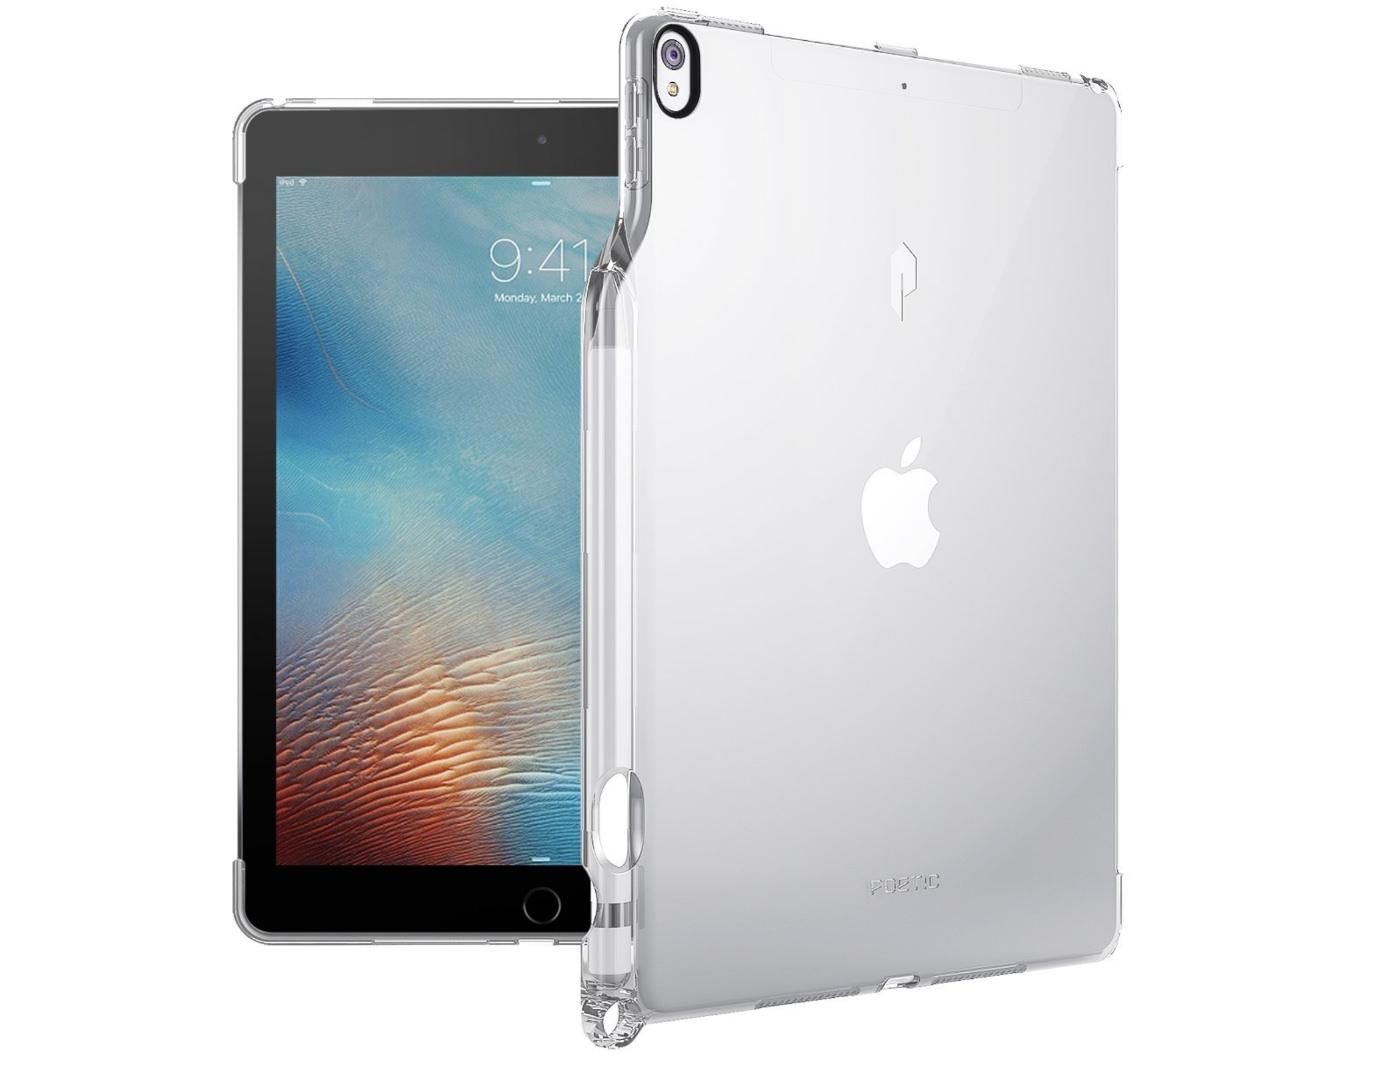 Apple Pencil」収納スロット&「Smart Keyboard」対応iPad Pro 10.5 ケース Poetic-2